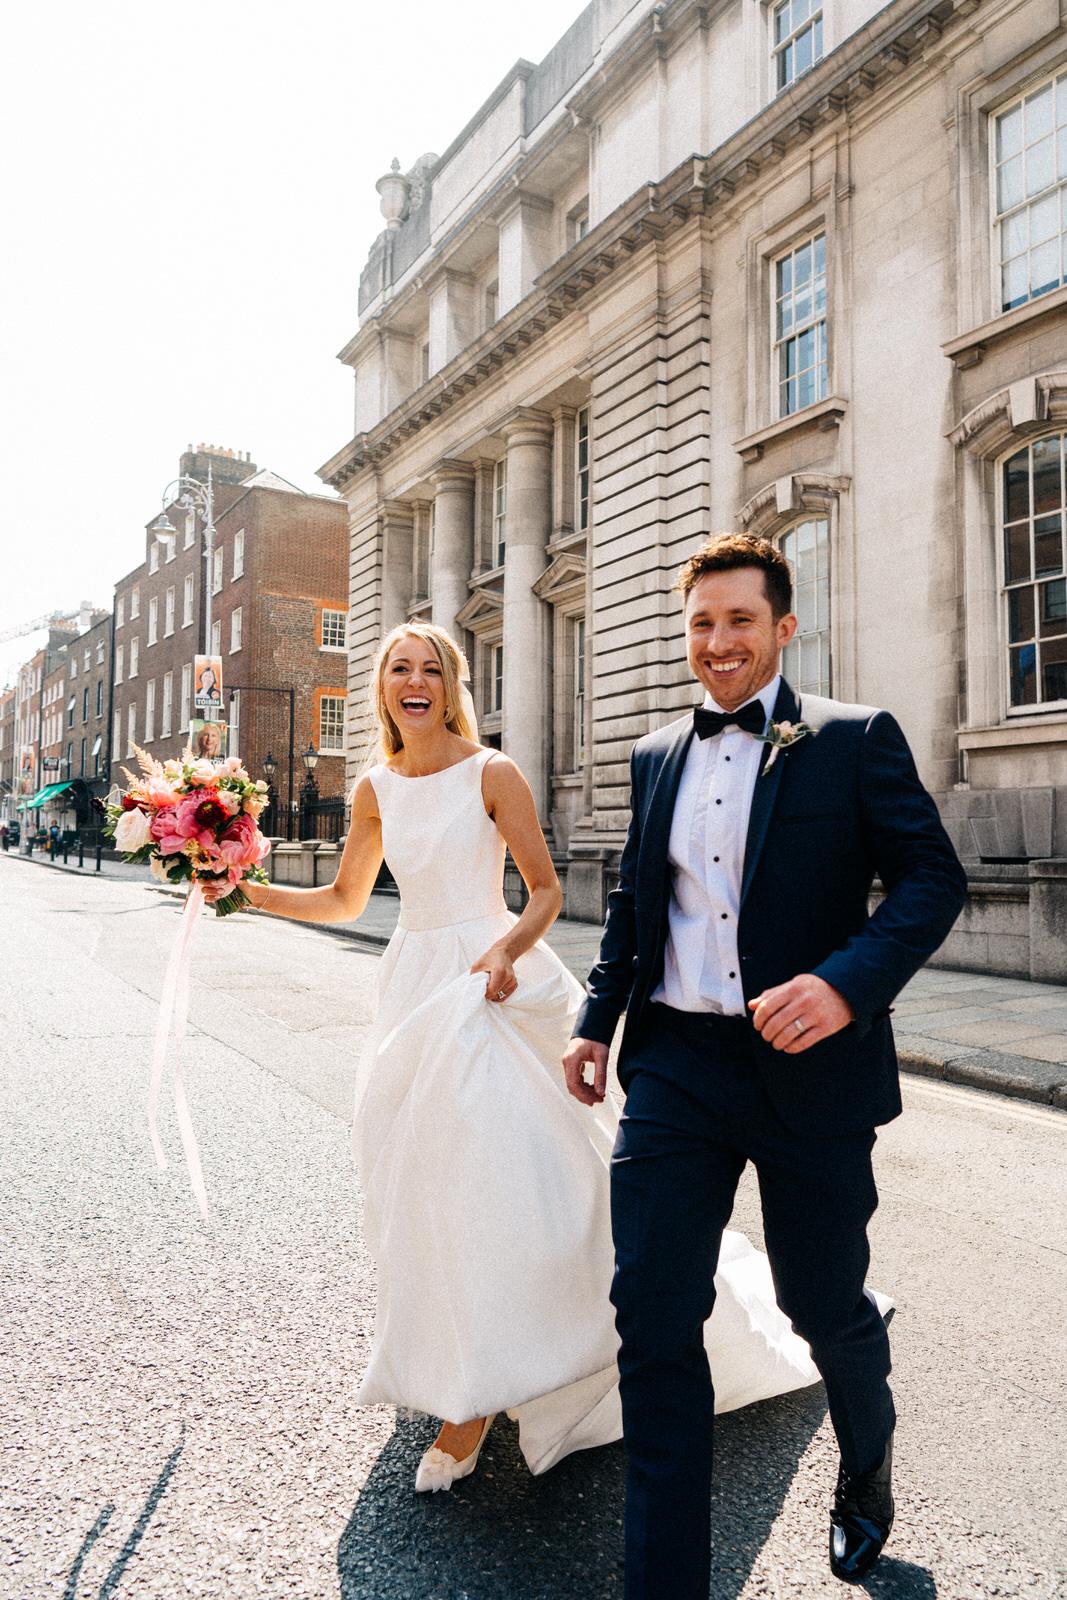 wedding photographer dublin 1,022 67